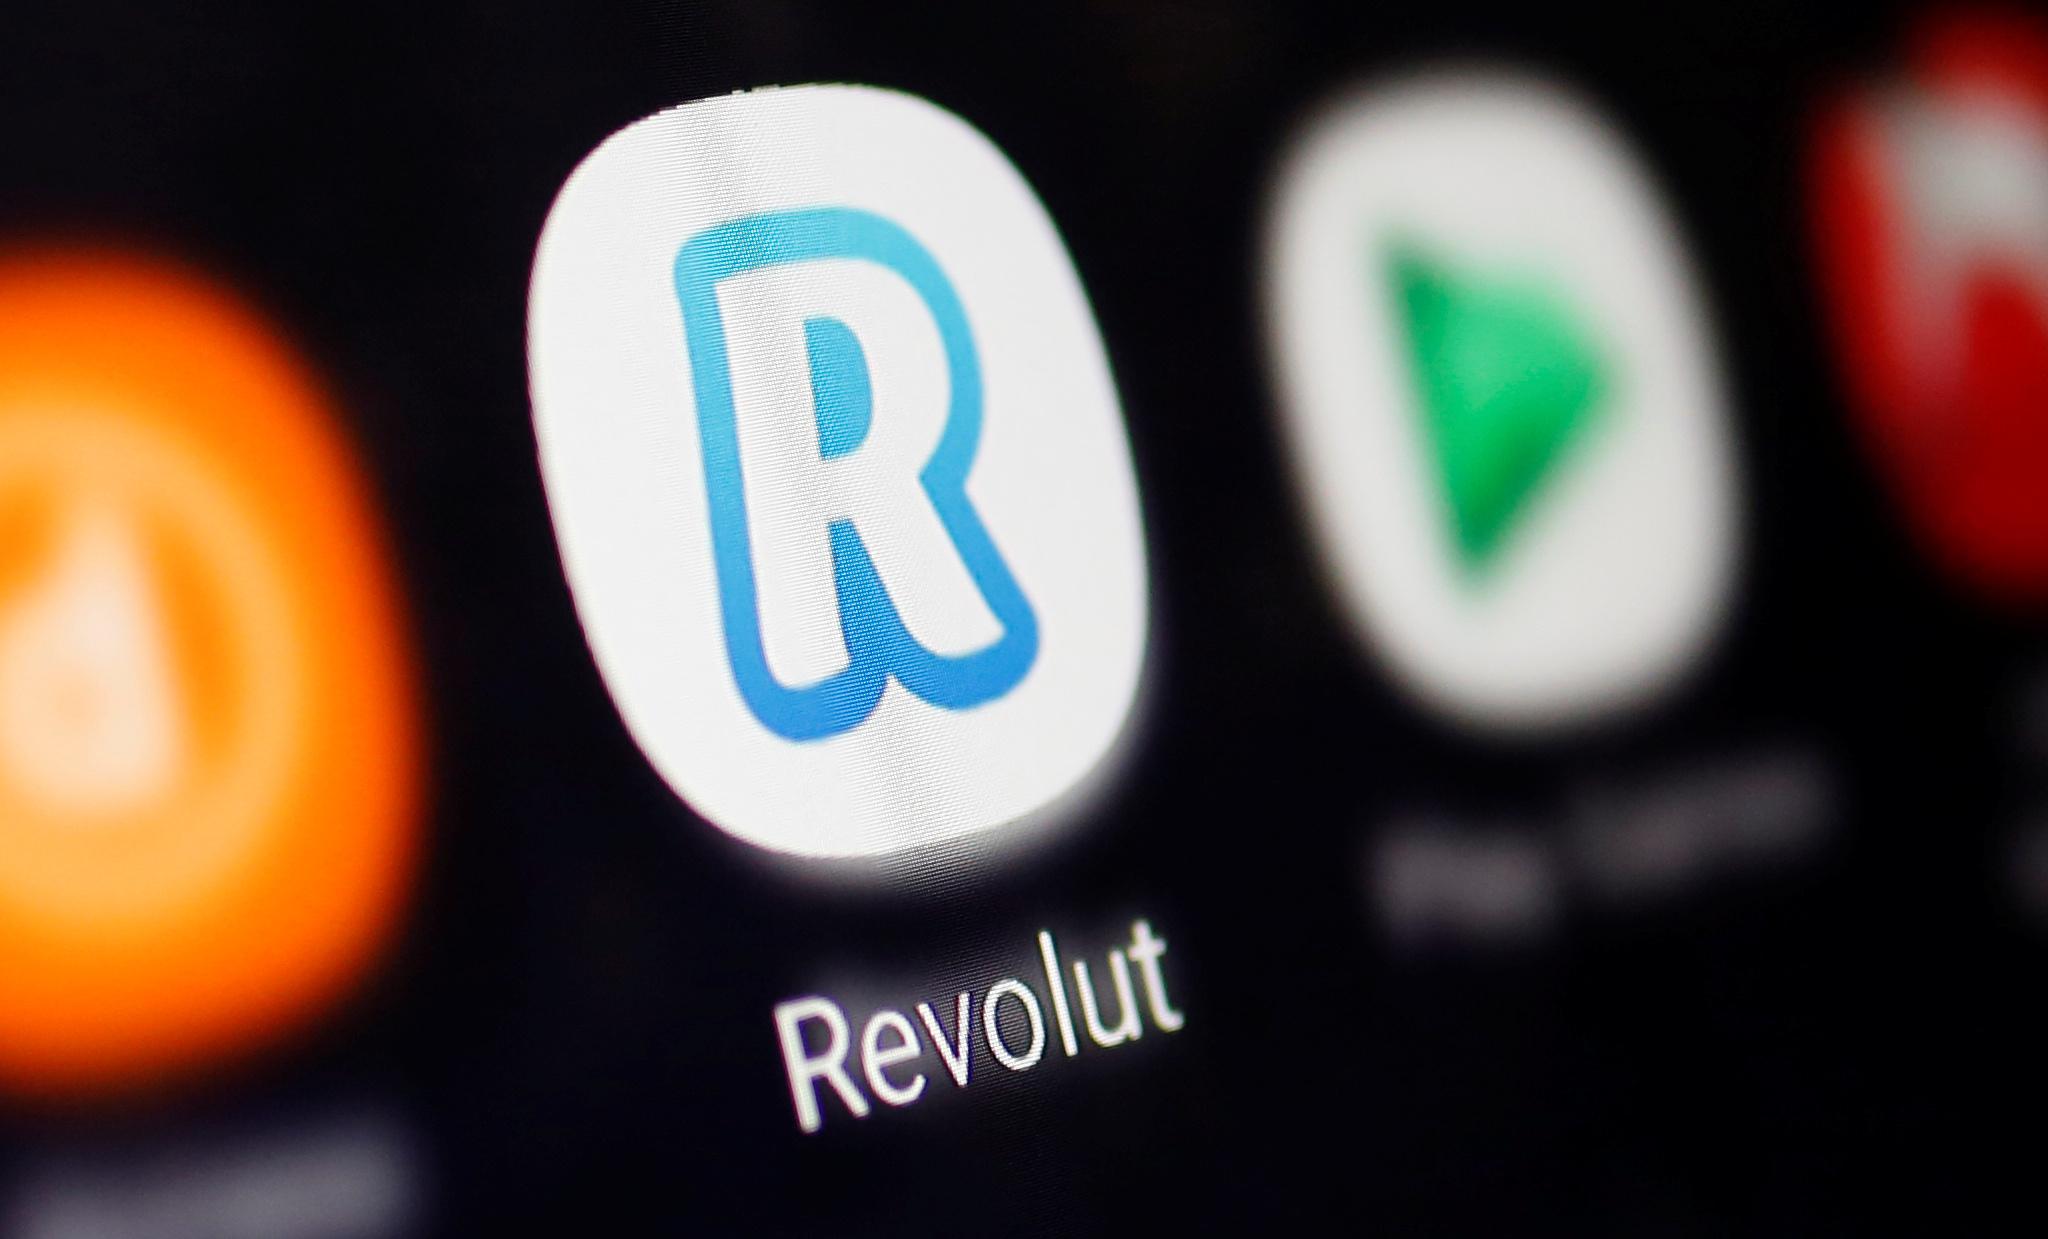 A Revolut logo is seen in this illustration taken January 6, 2020. REUTERS/Dado Ruvic/Illustration